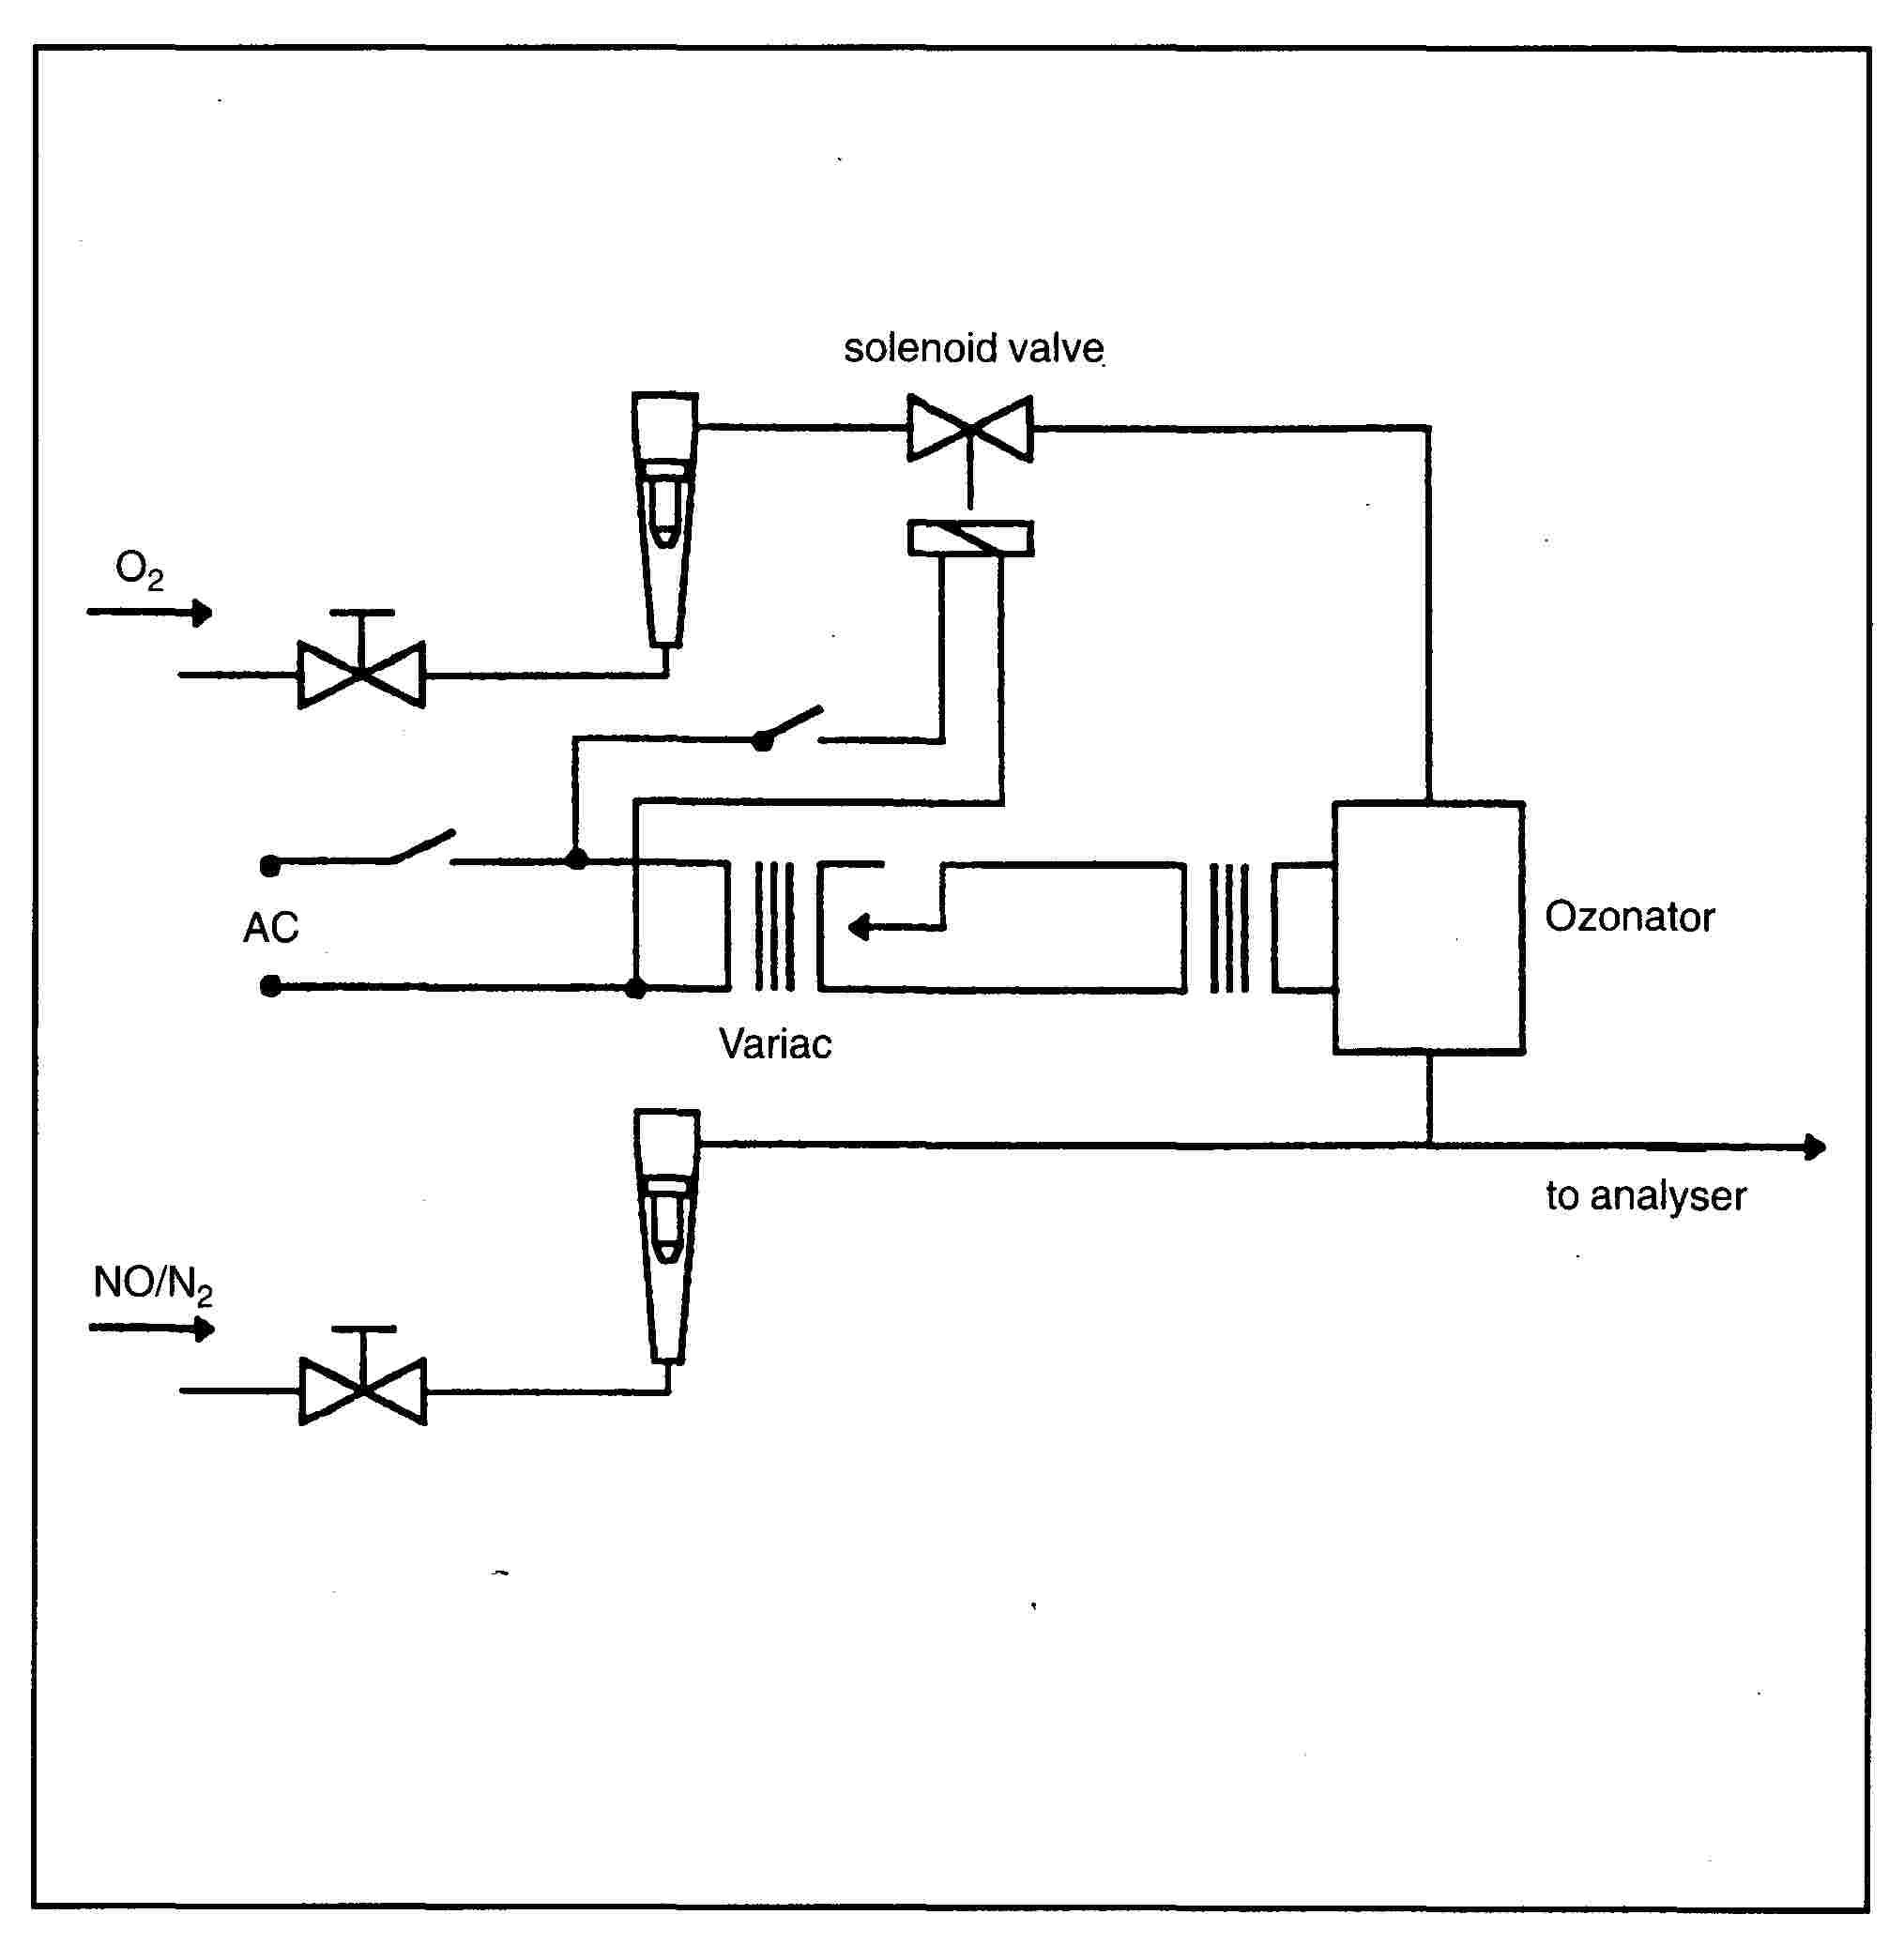 Eur Lex 01997l0068 20070101 En Battery Rack Alpha Wiring Diagram Figure 1 Schematic